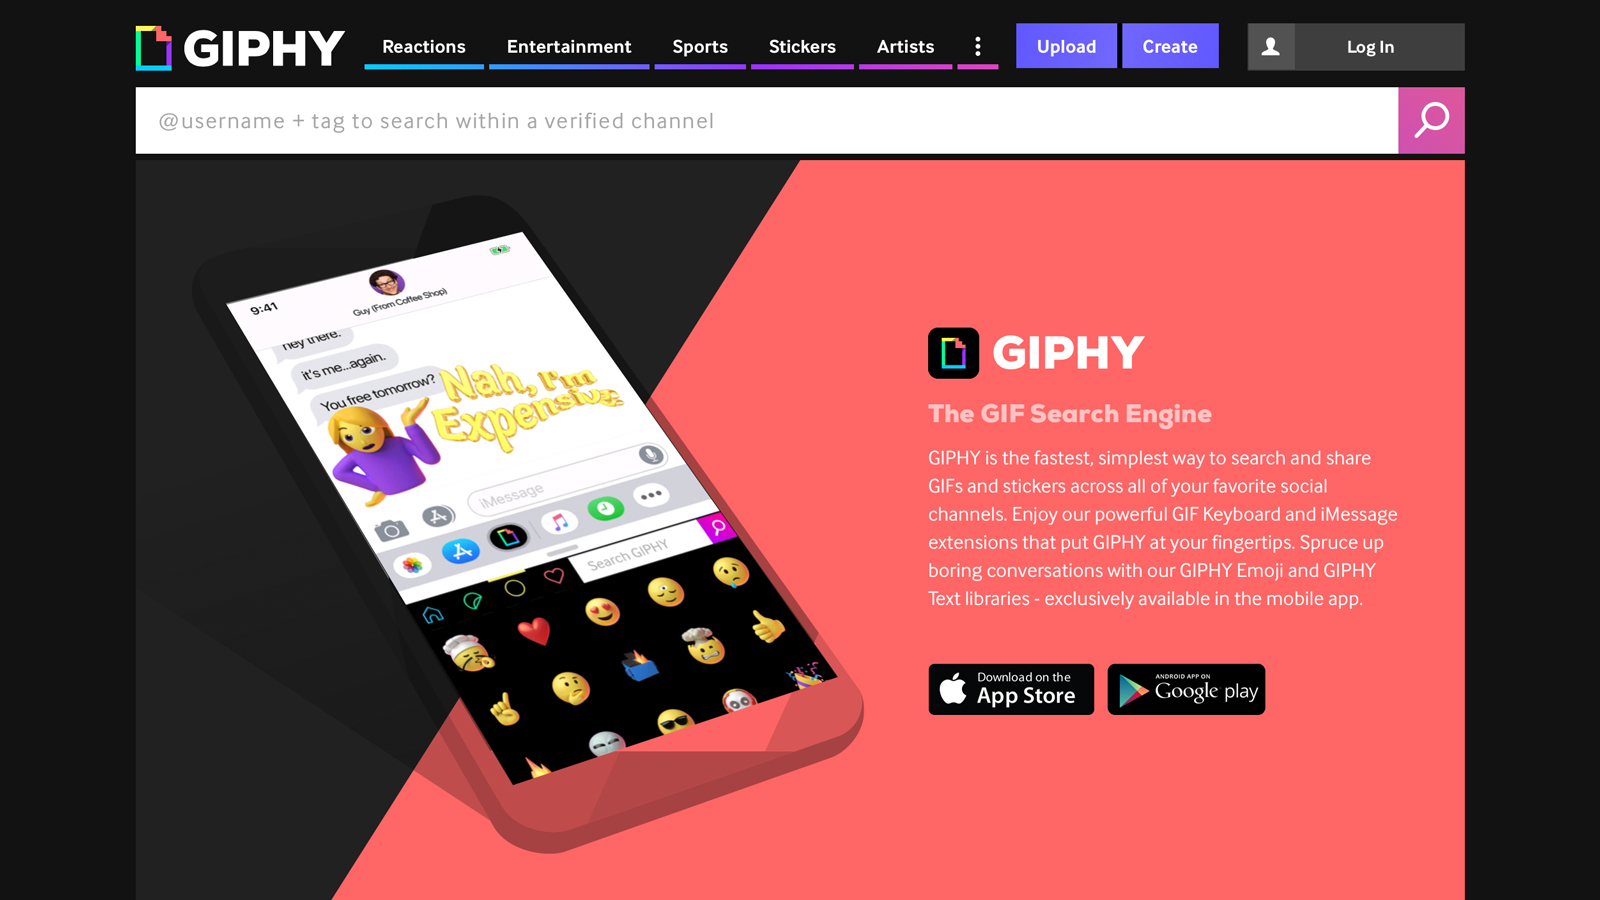 Facebook z zakupem za ok. 400 000 000$ Social media mediarun giphy facebook www aplikacja 2020